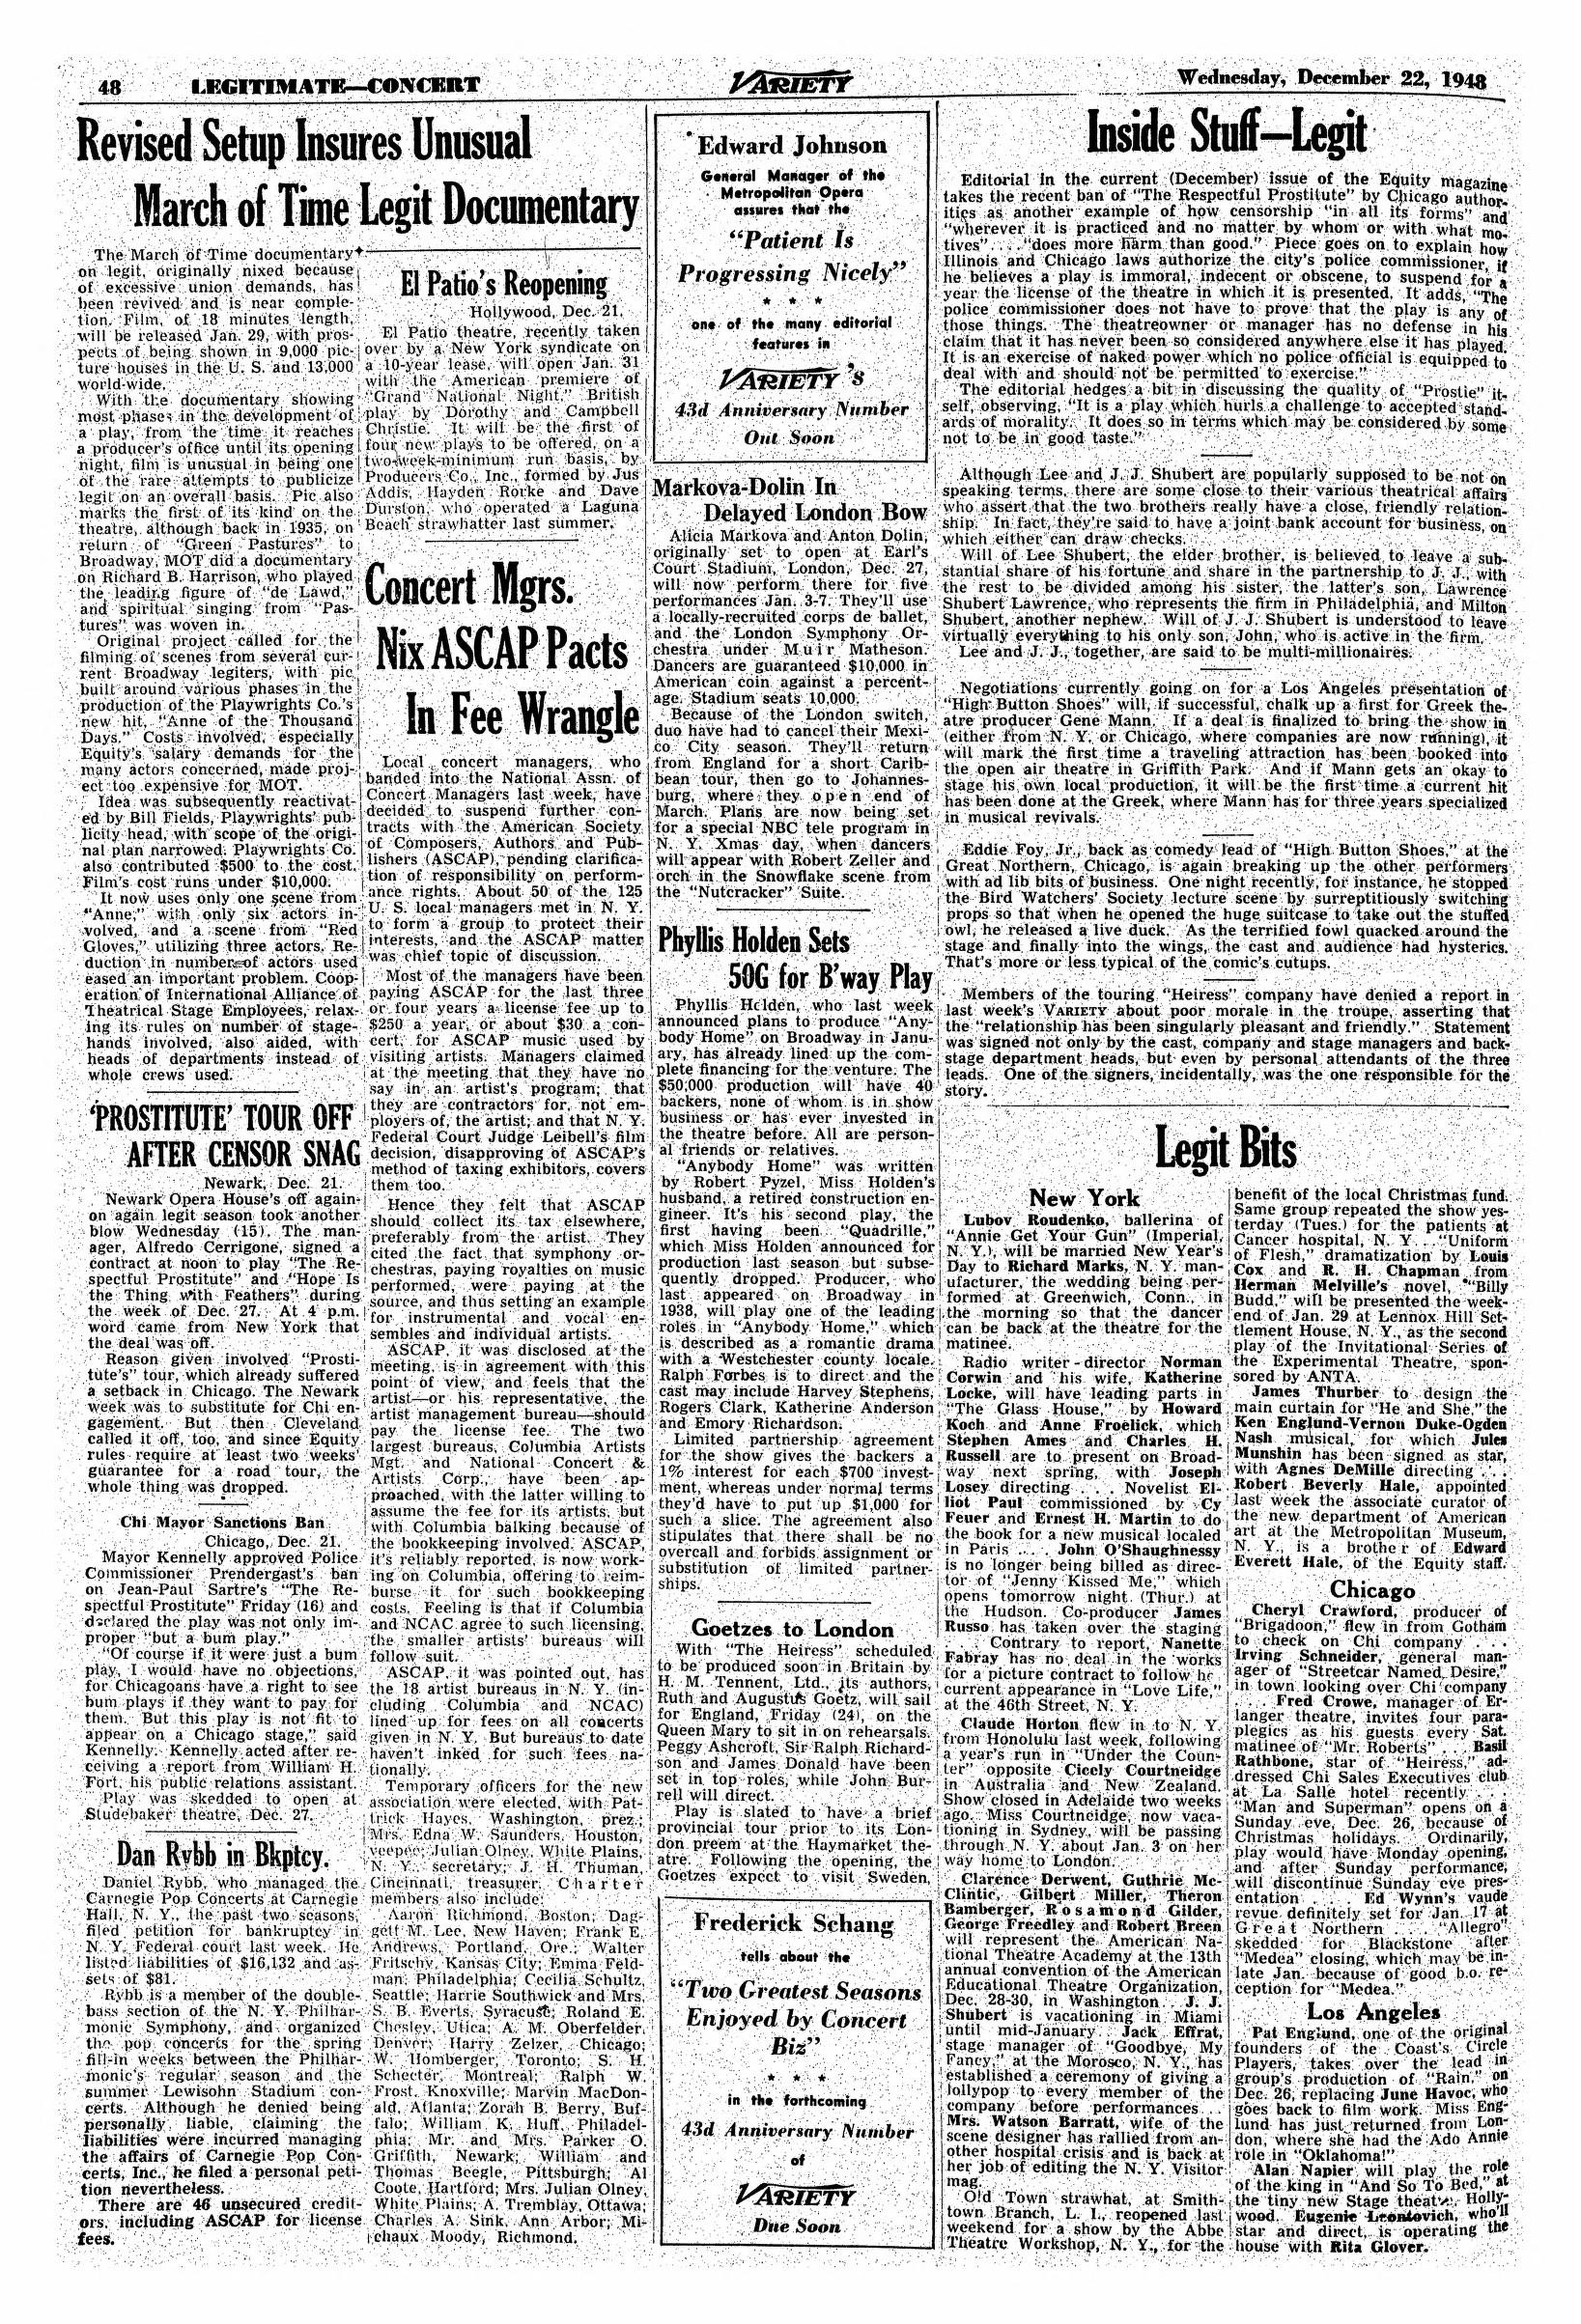 Variety172-1948-12_jp2.zip&file=variety172-1948-12_jp2%2fvariety172-1948-12_0223